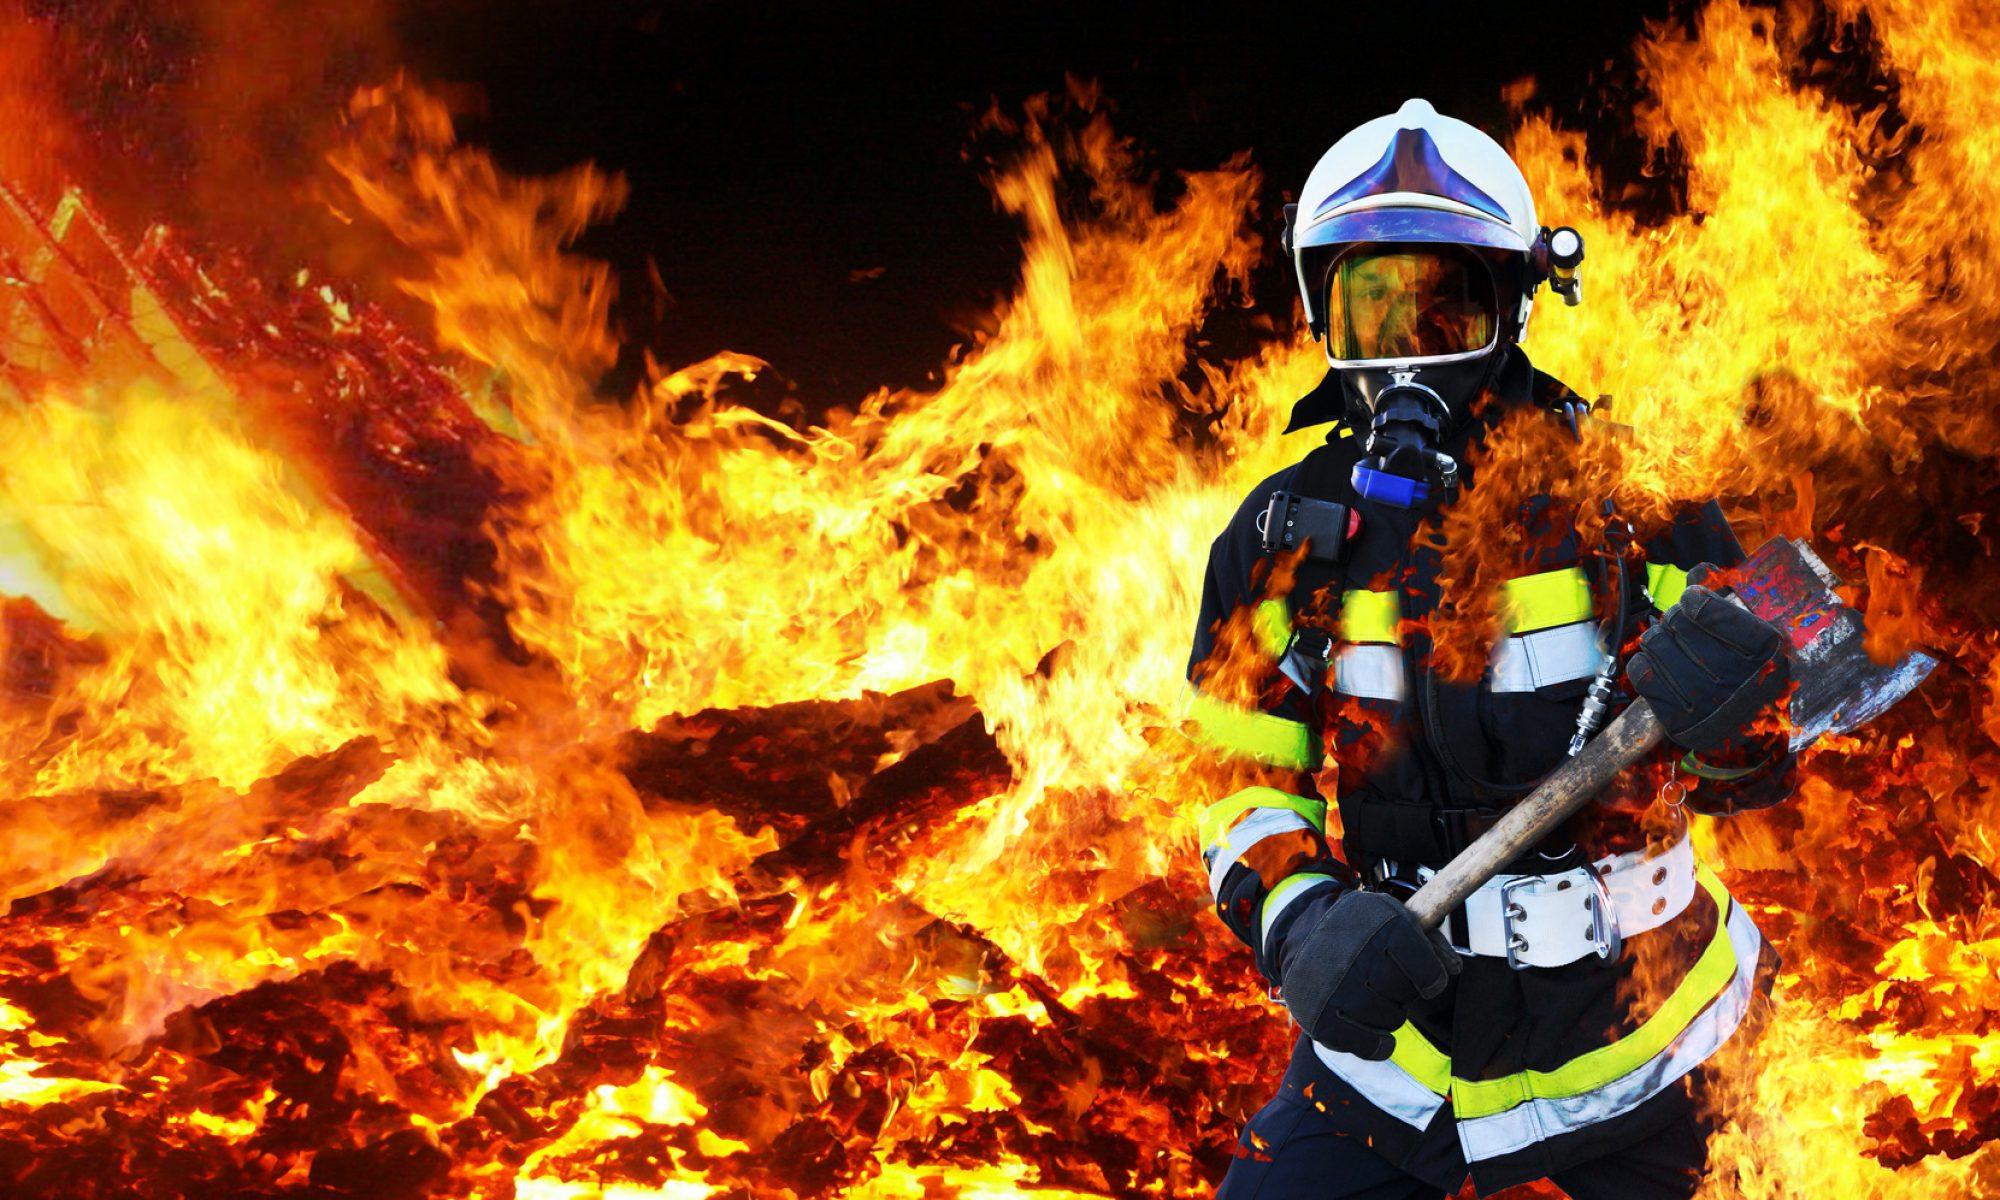 Förderverein Freiwillige Feuerwehr Esenshamm e.V.